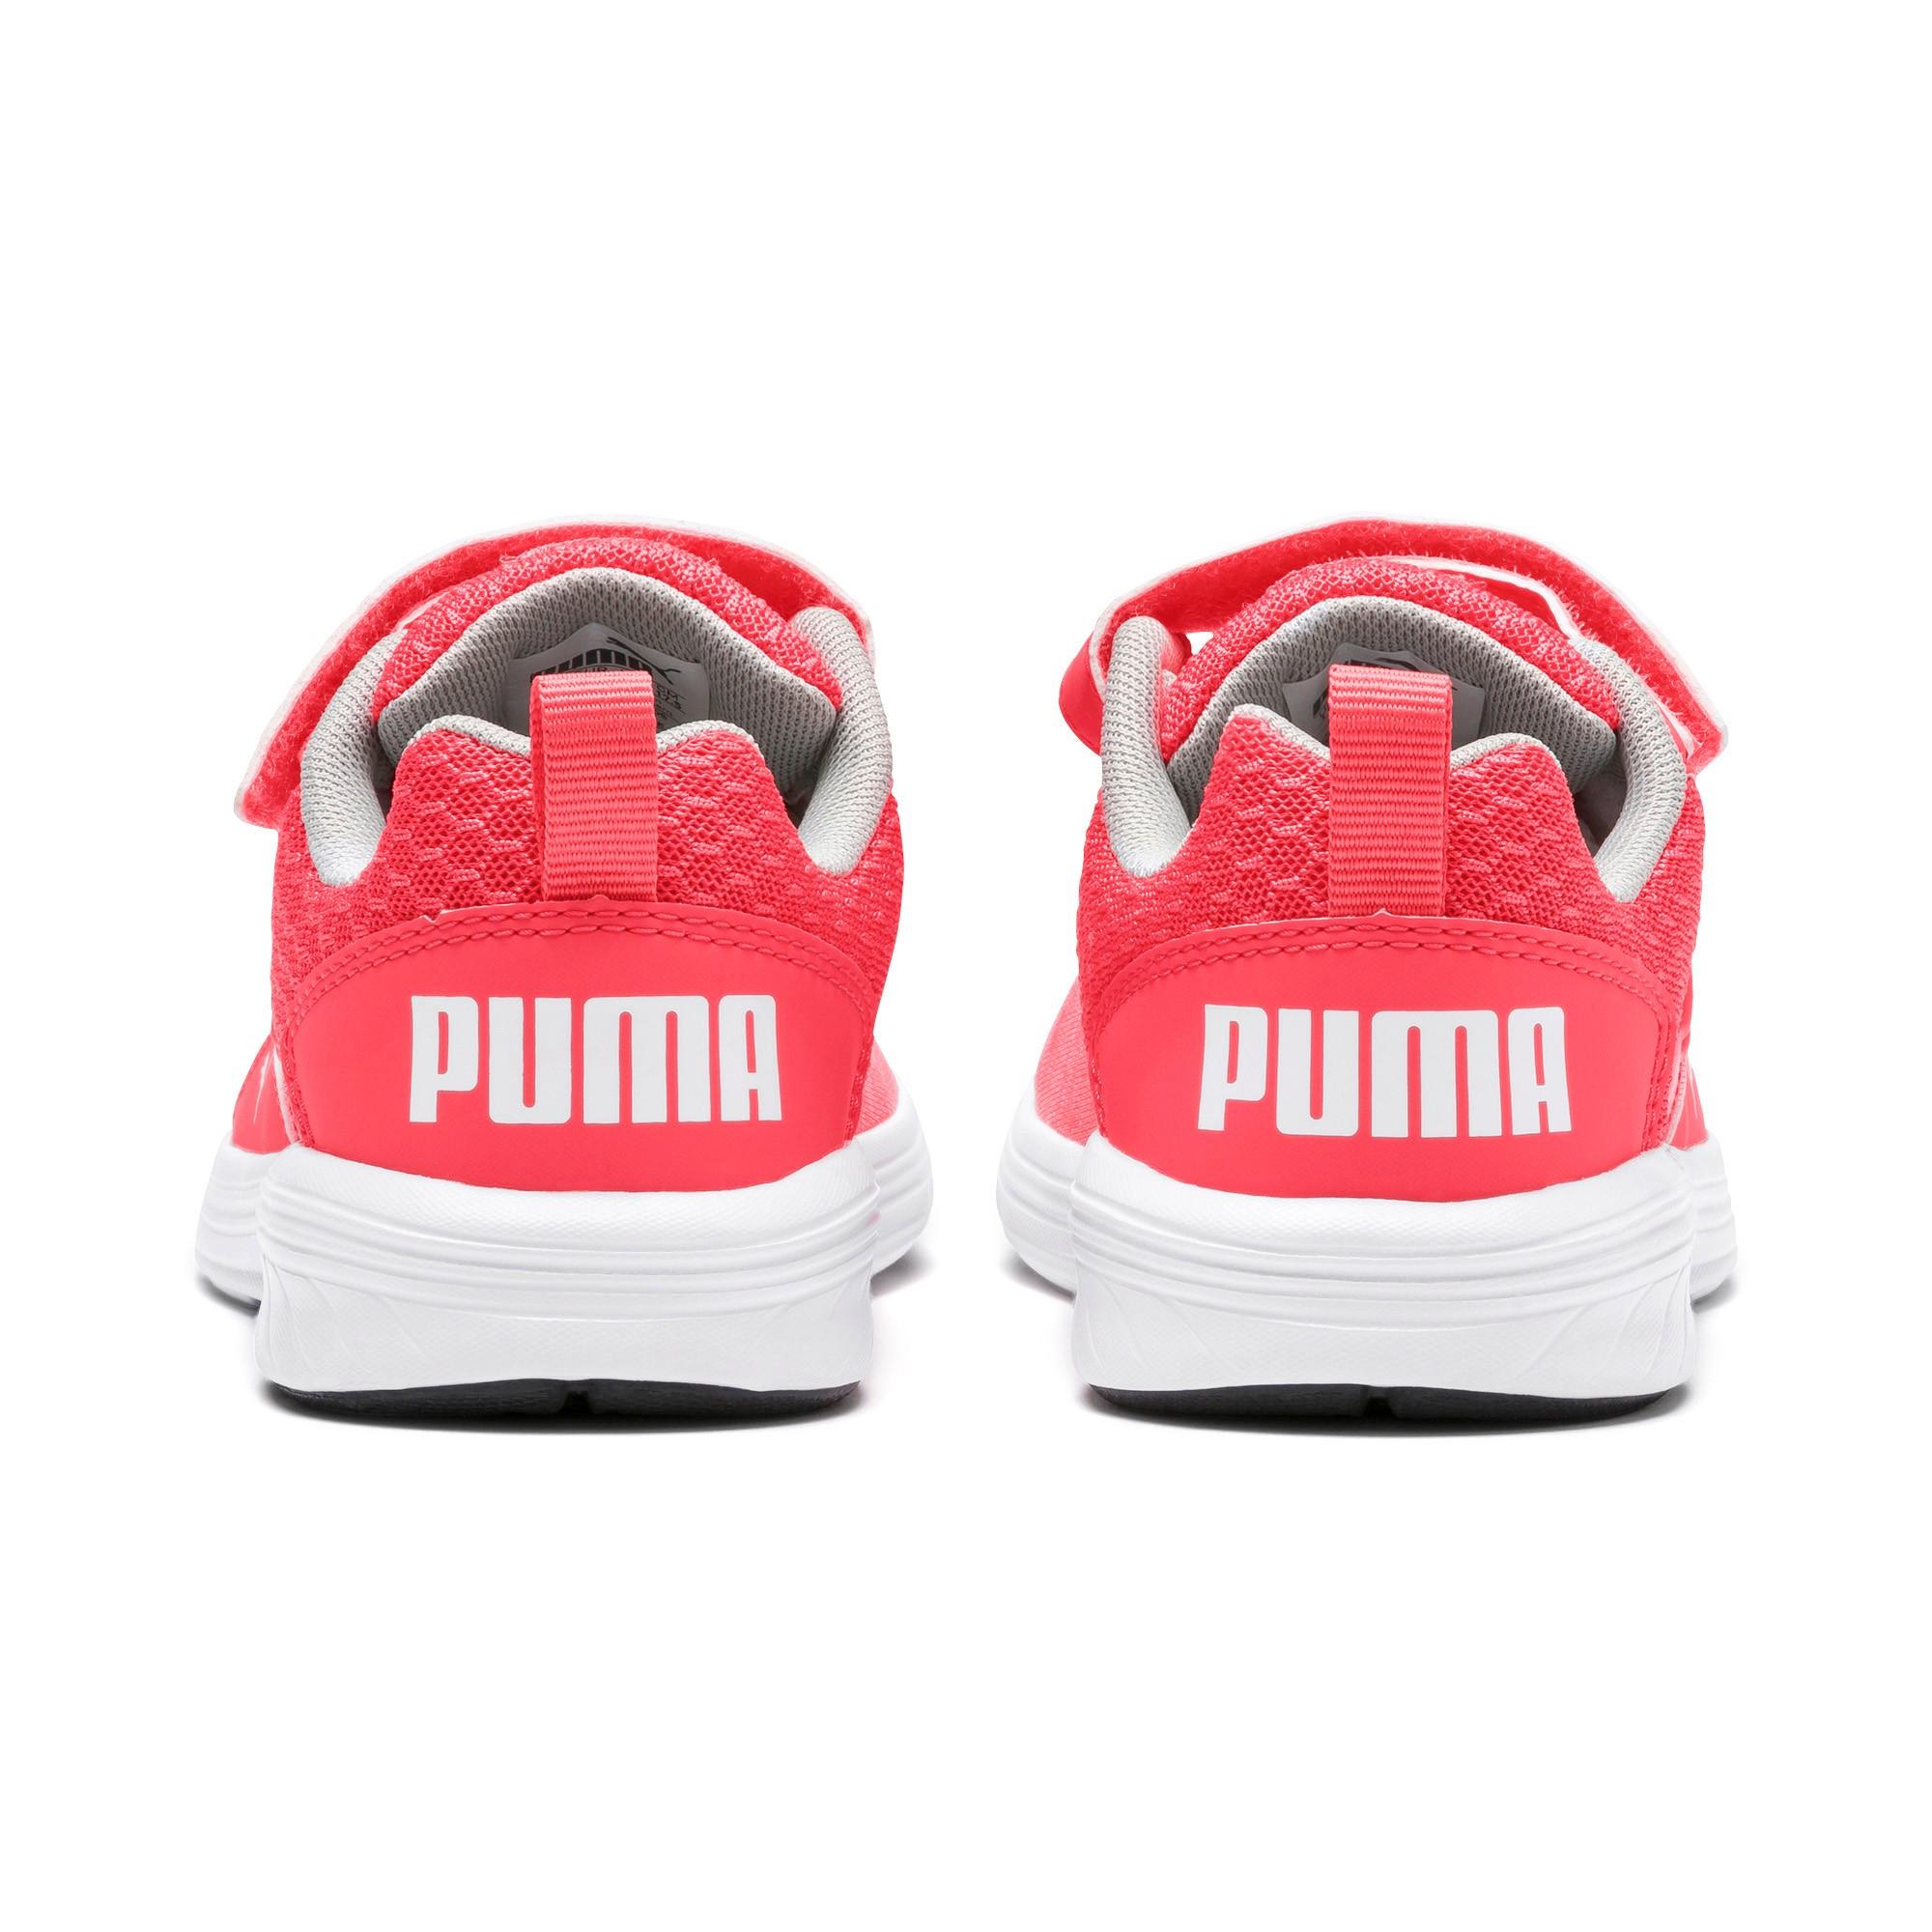 puma__pum-190676-12__47